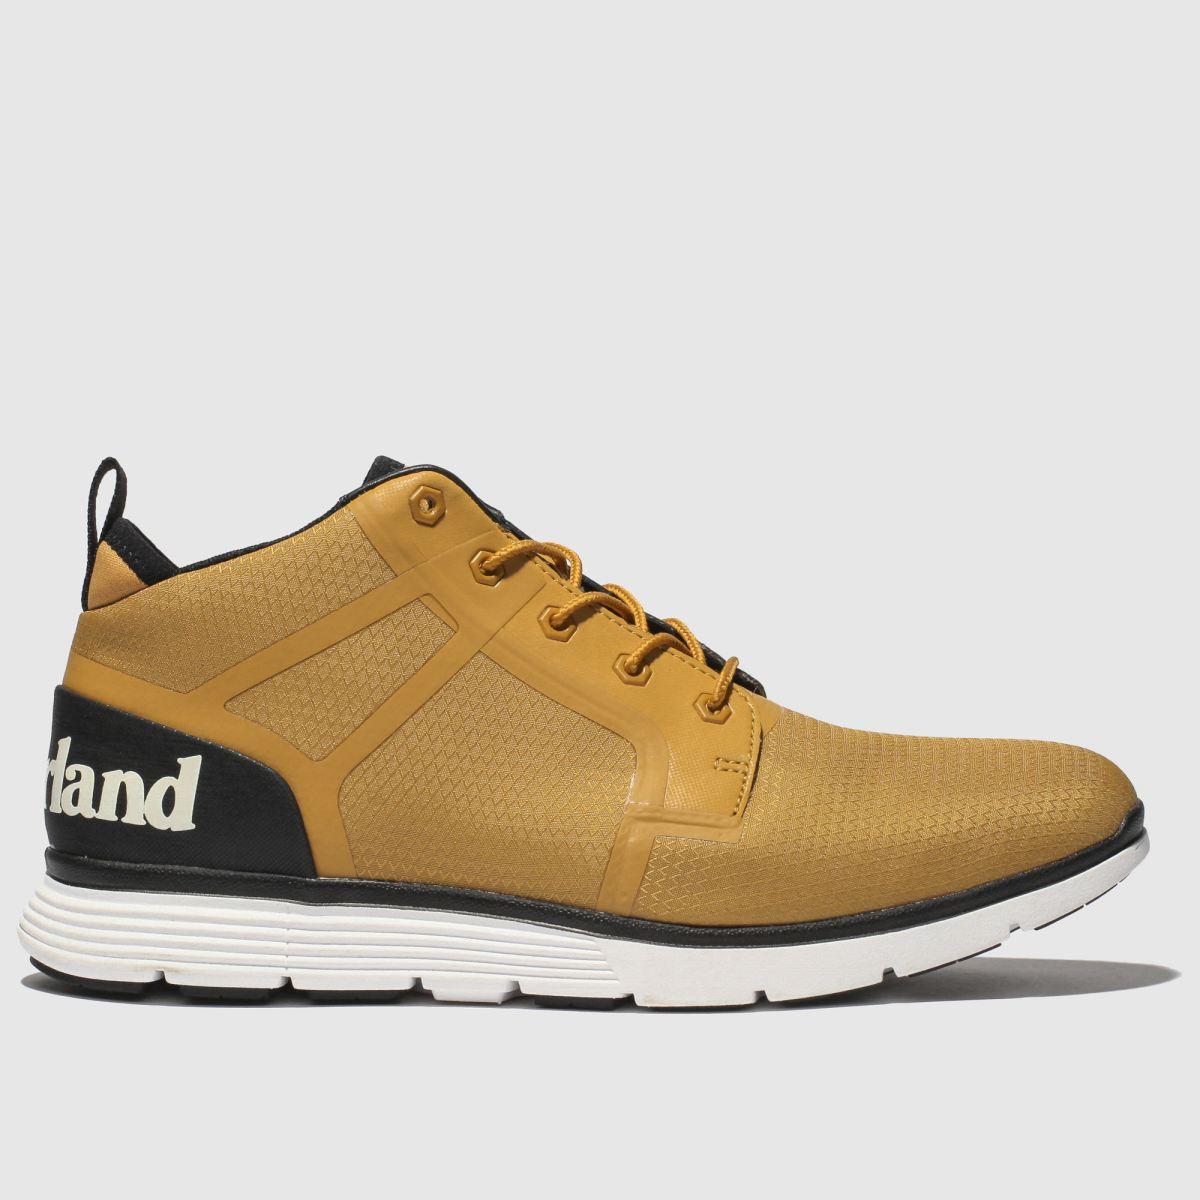 Timberland Tan Killington Super Boots